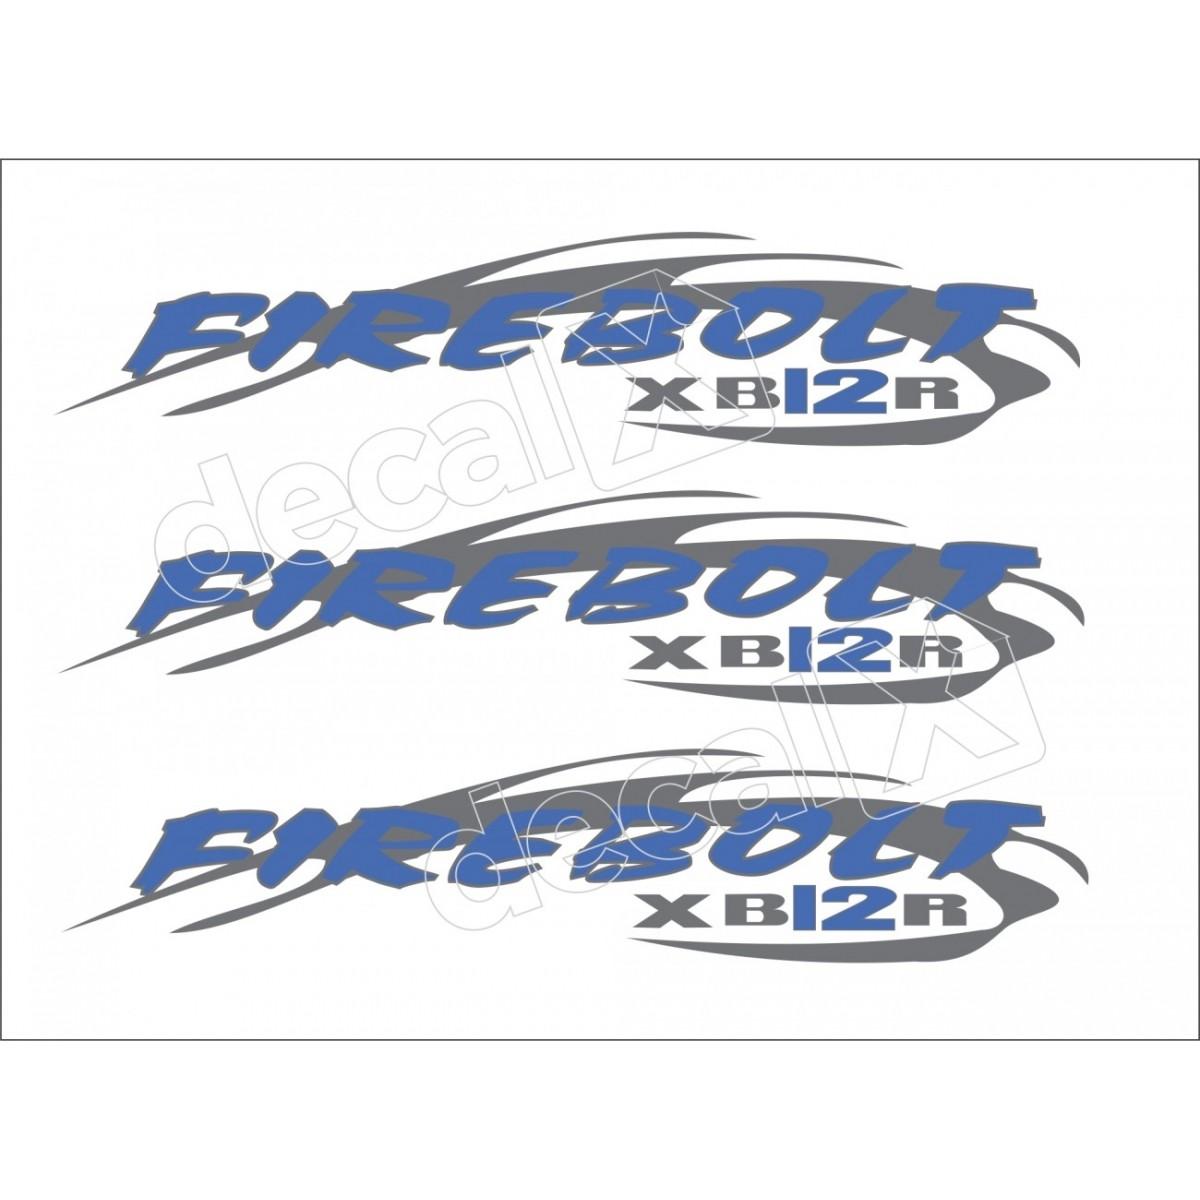 Emblema Adesivo Buell Xb 12r Branca Decalx